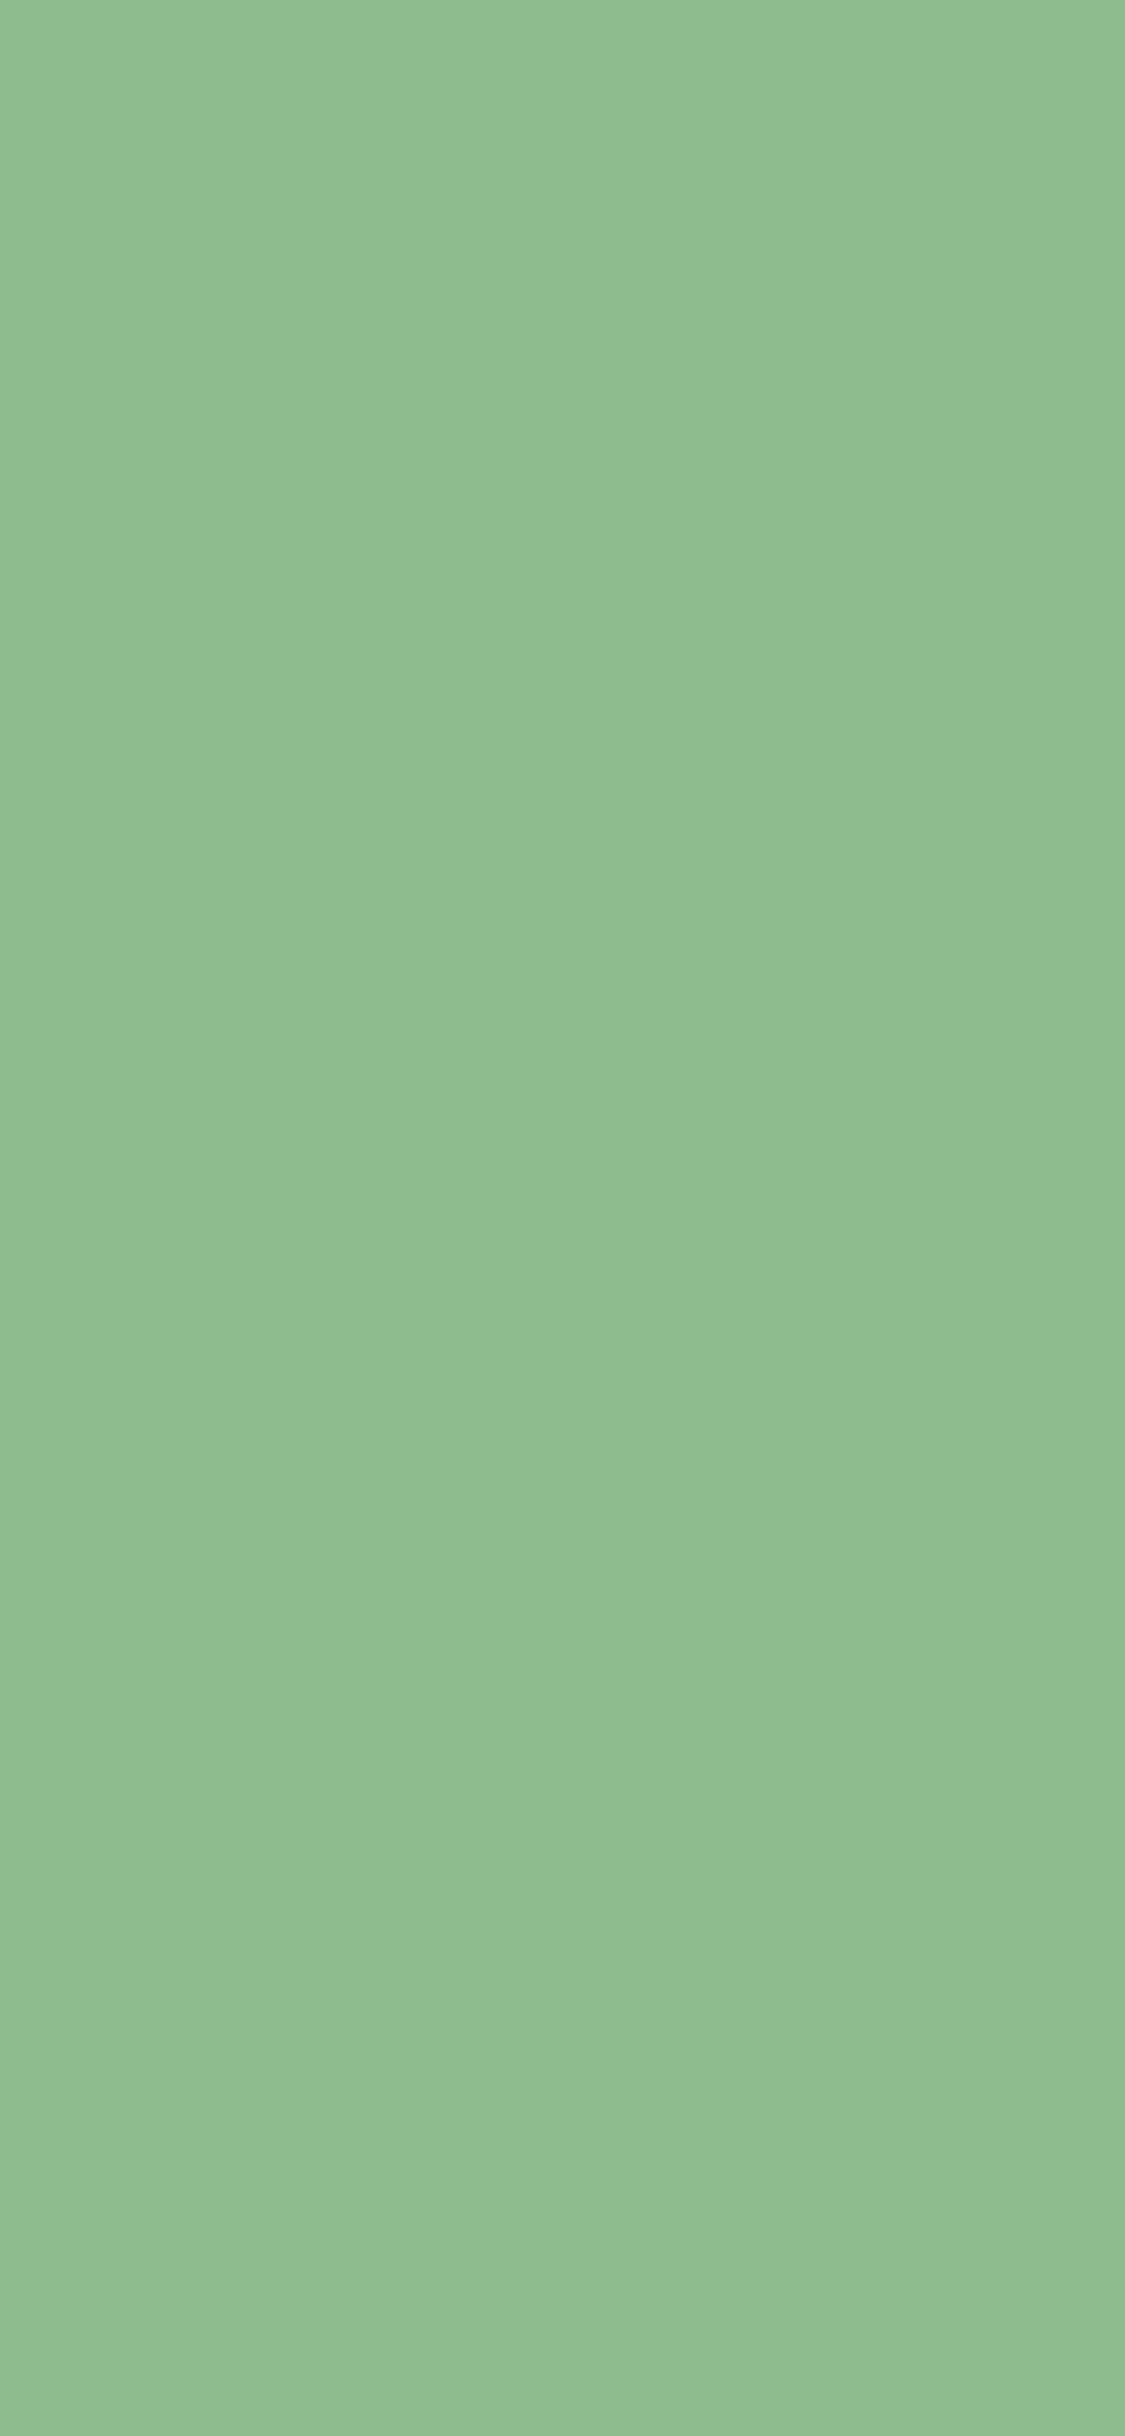 1125x2436 Dark Sea Green Solid Color Background